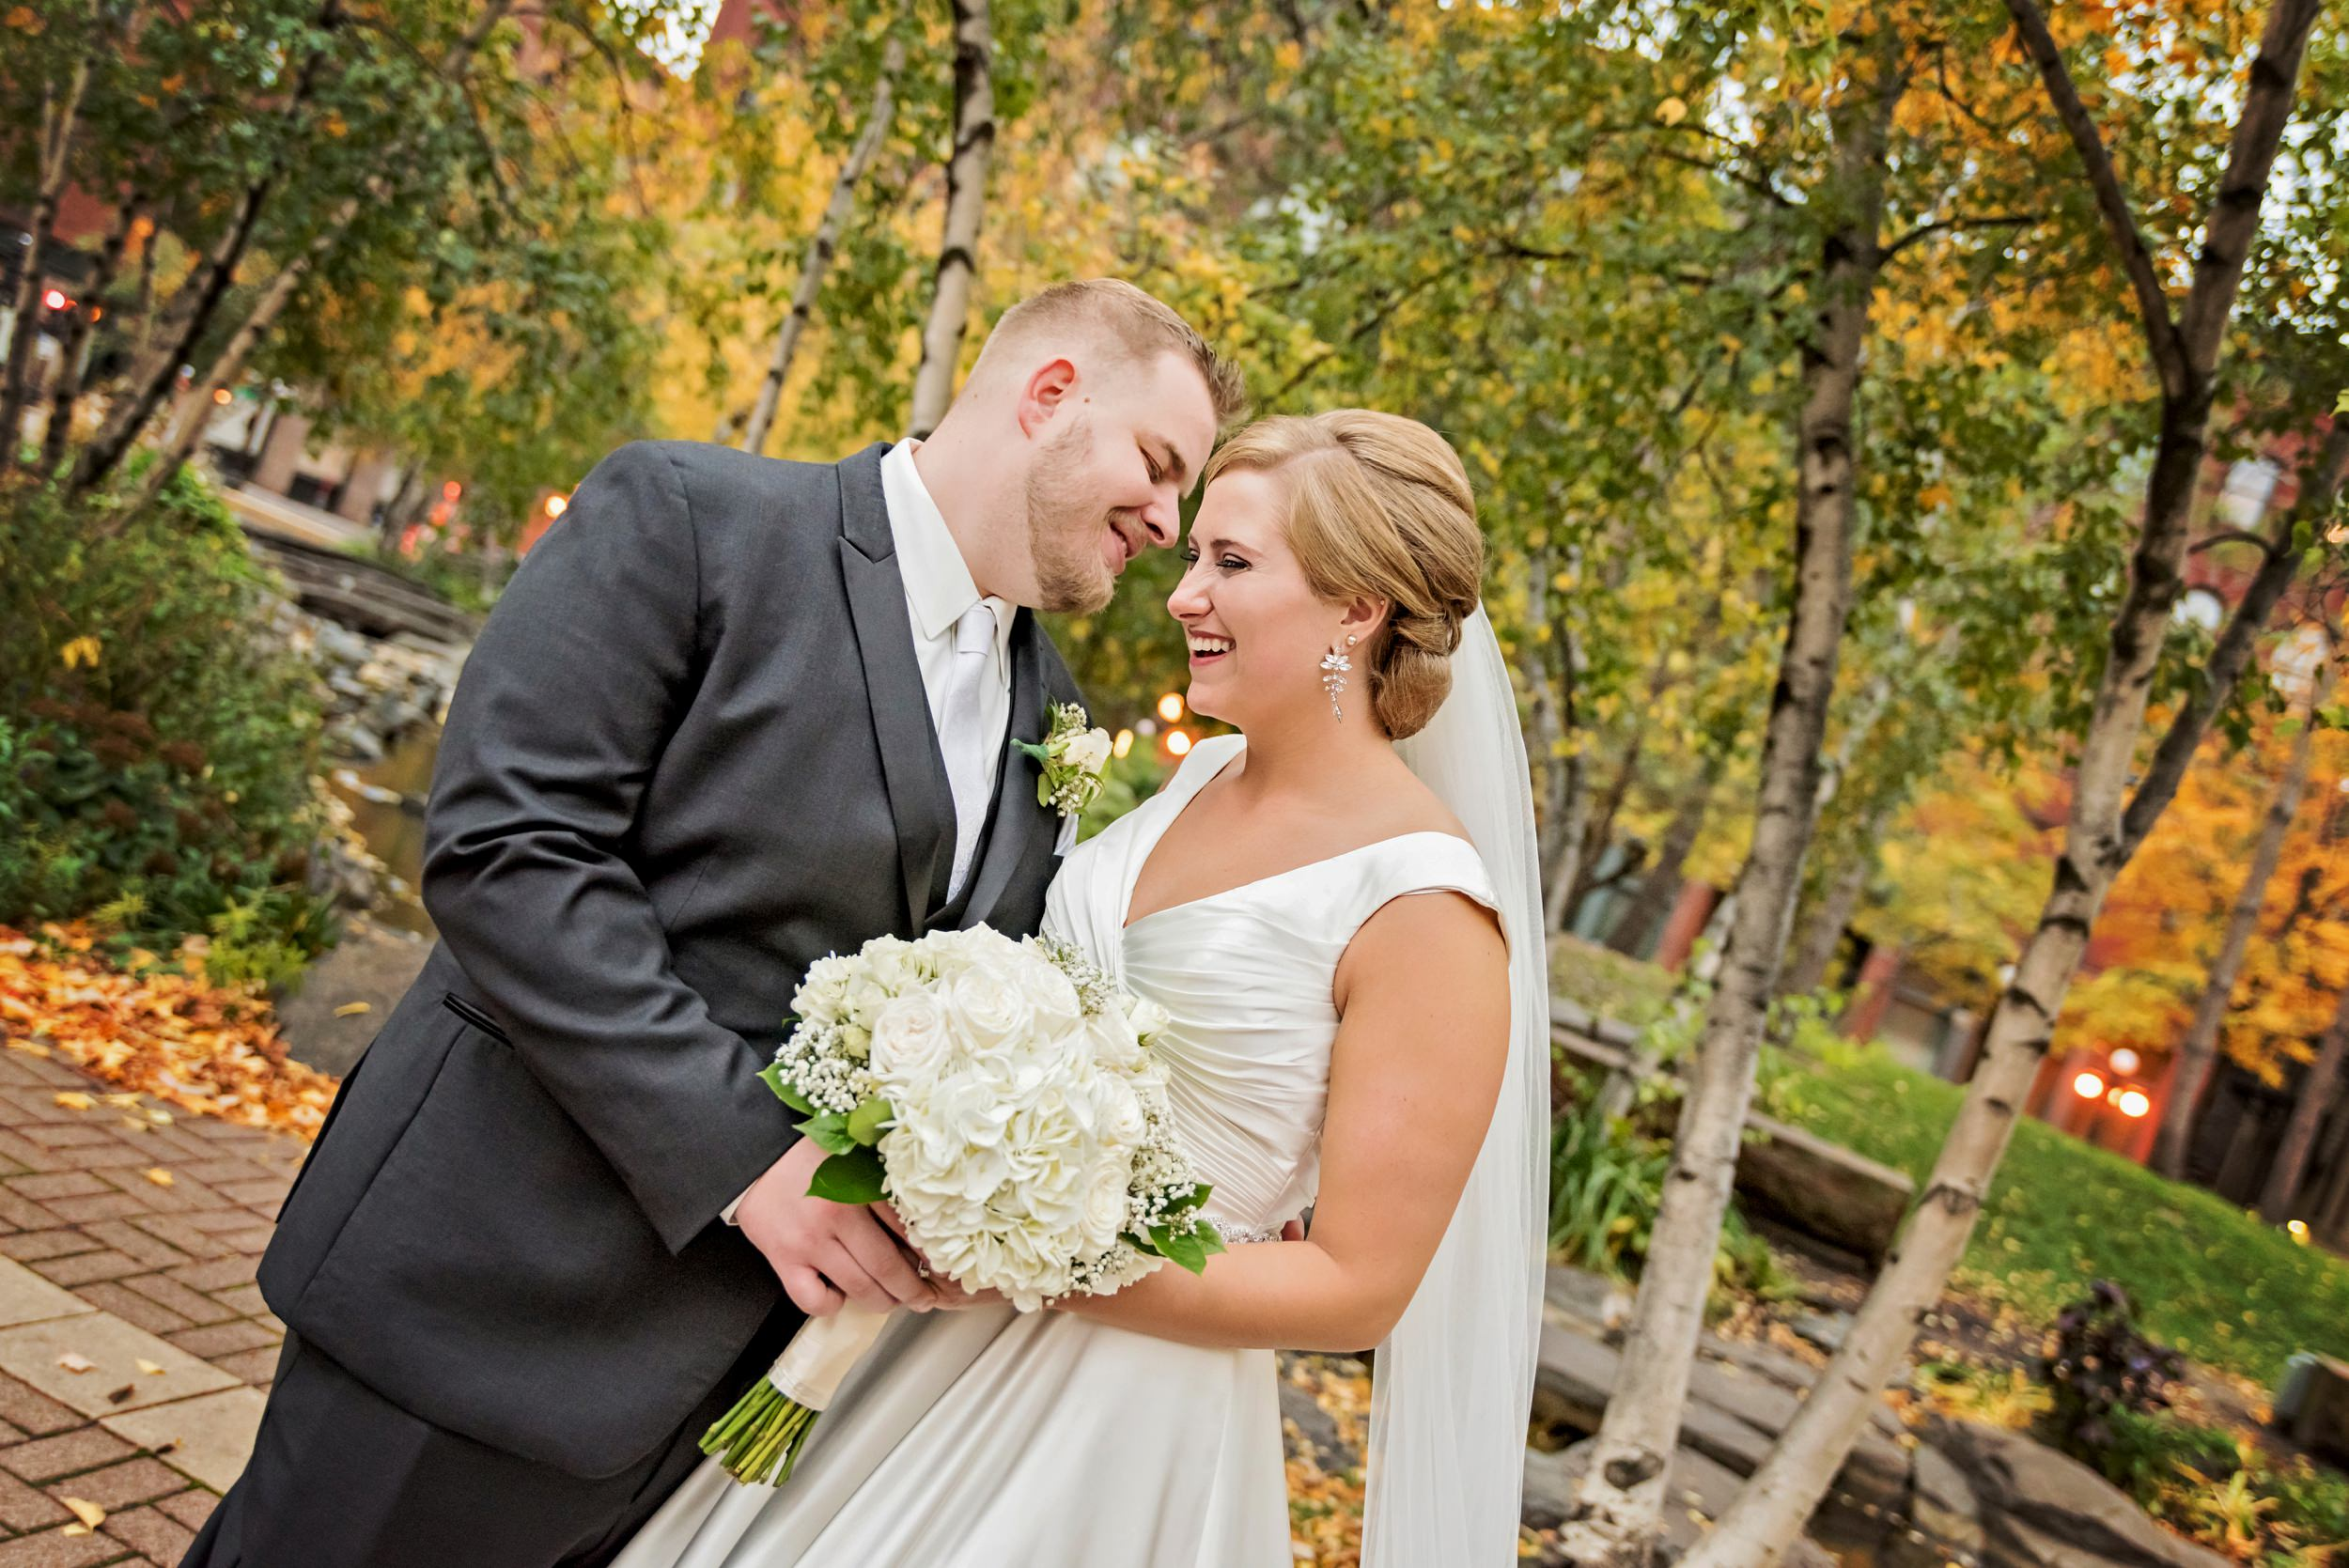 2018-Real-Wedding-Megan-Brenden-Rotella-Photography_0419.jpg